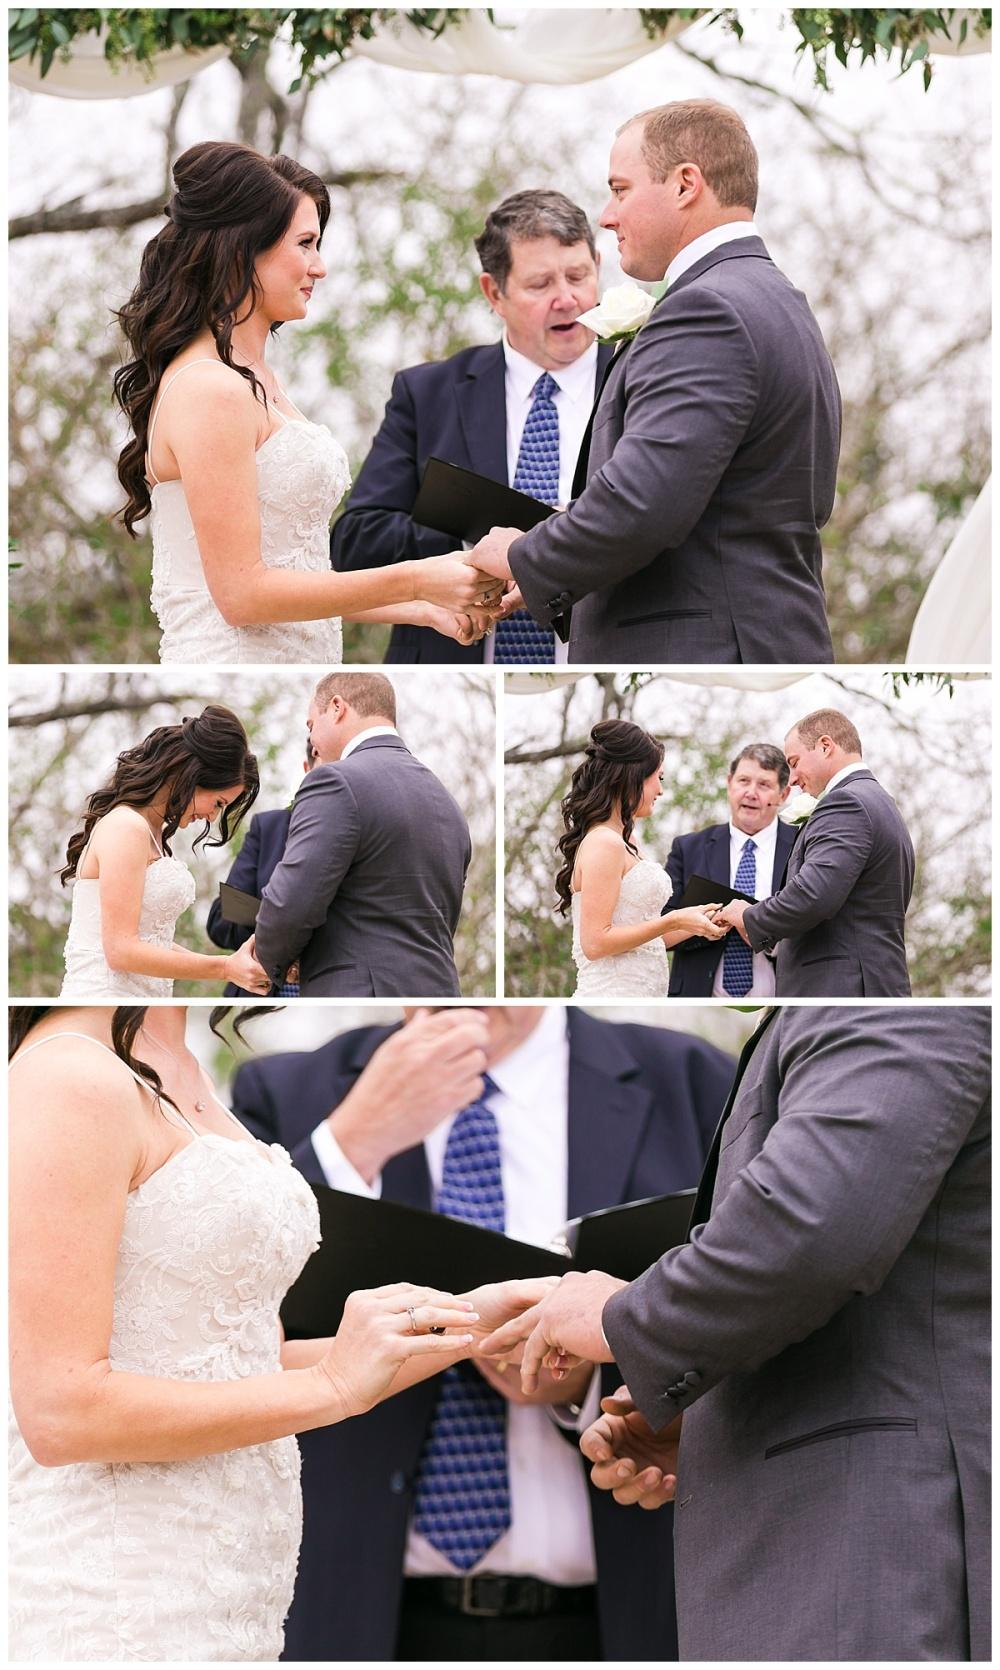 Carly-Barton-Photography-Geronimo-Oaks-Wedding-Venue-Texas-Hill-Country-Ronnie-Sarah_0103.jpg